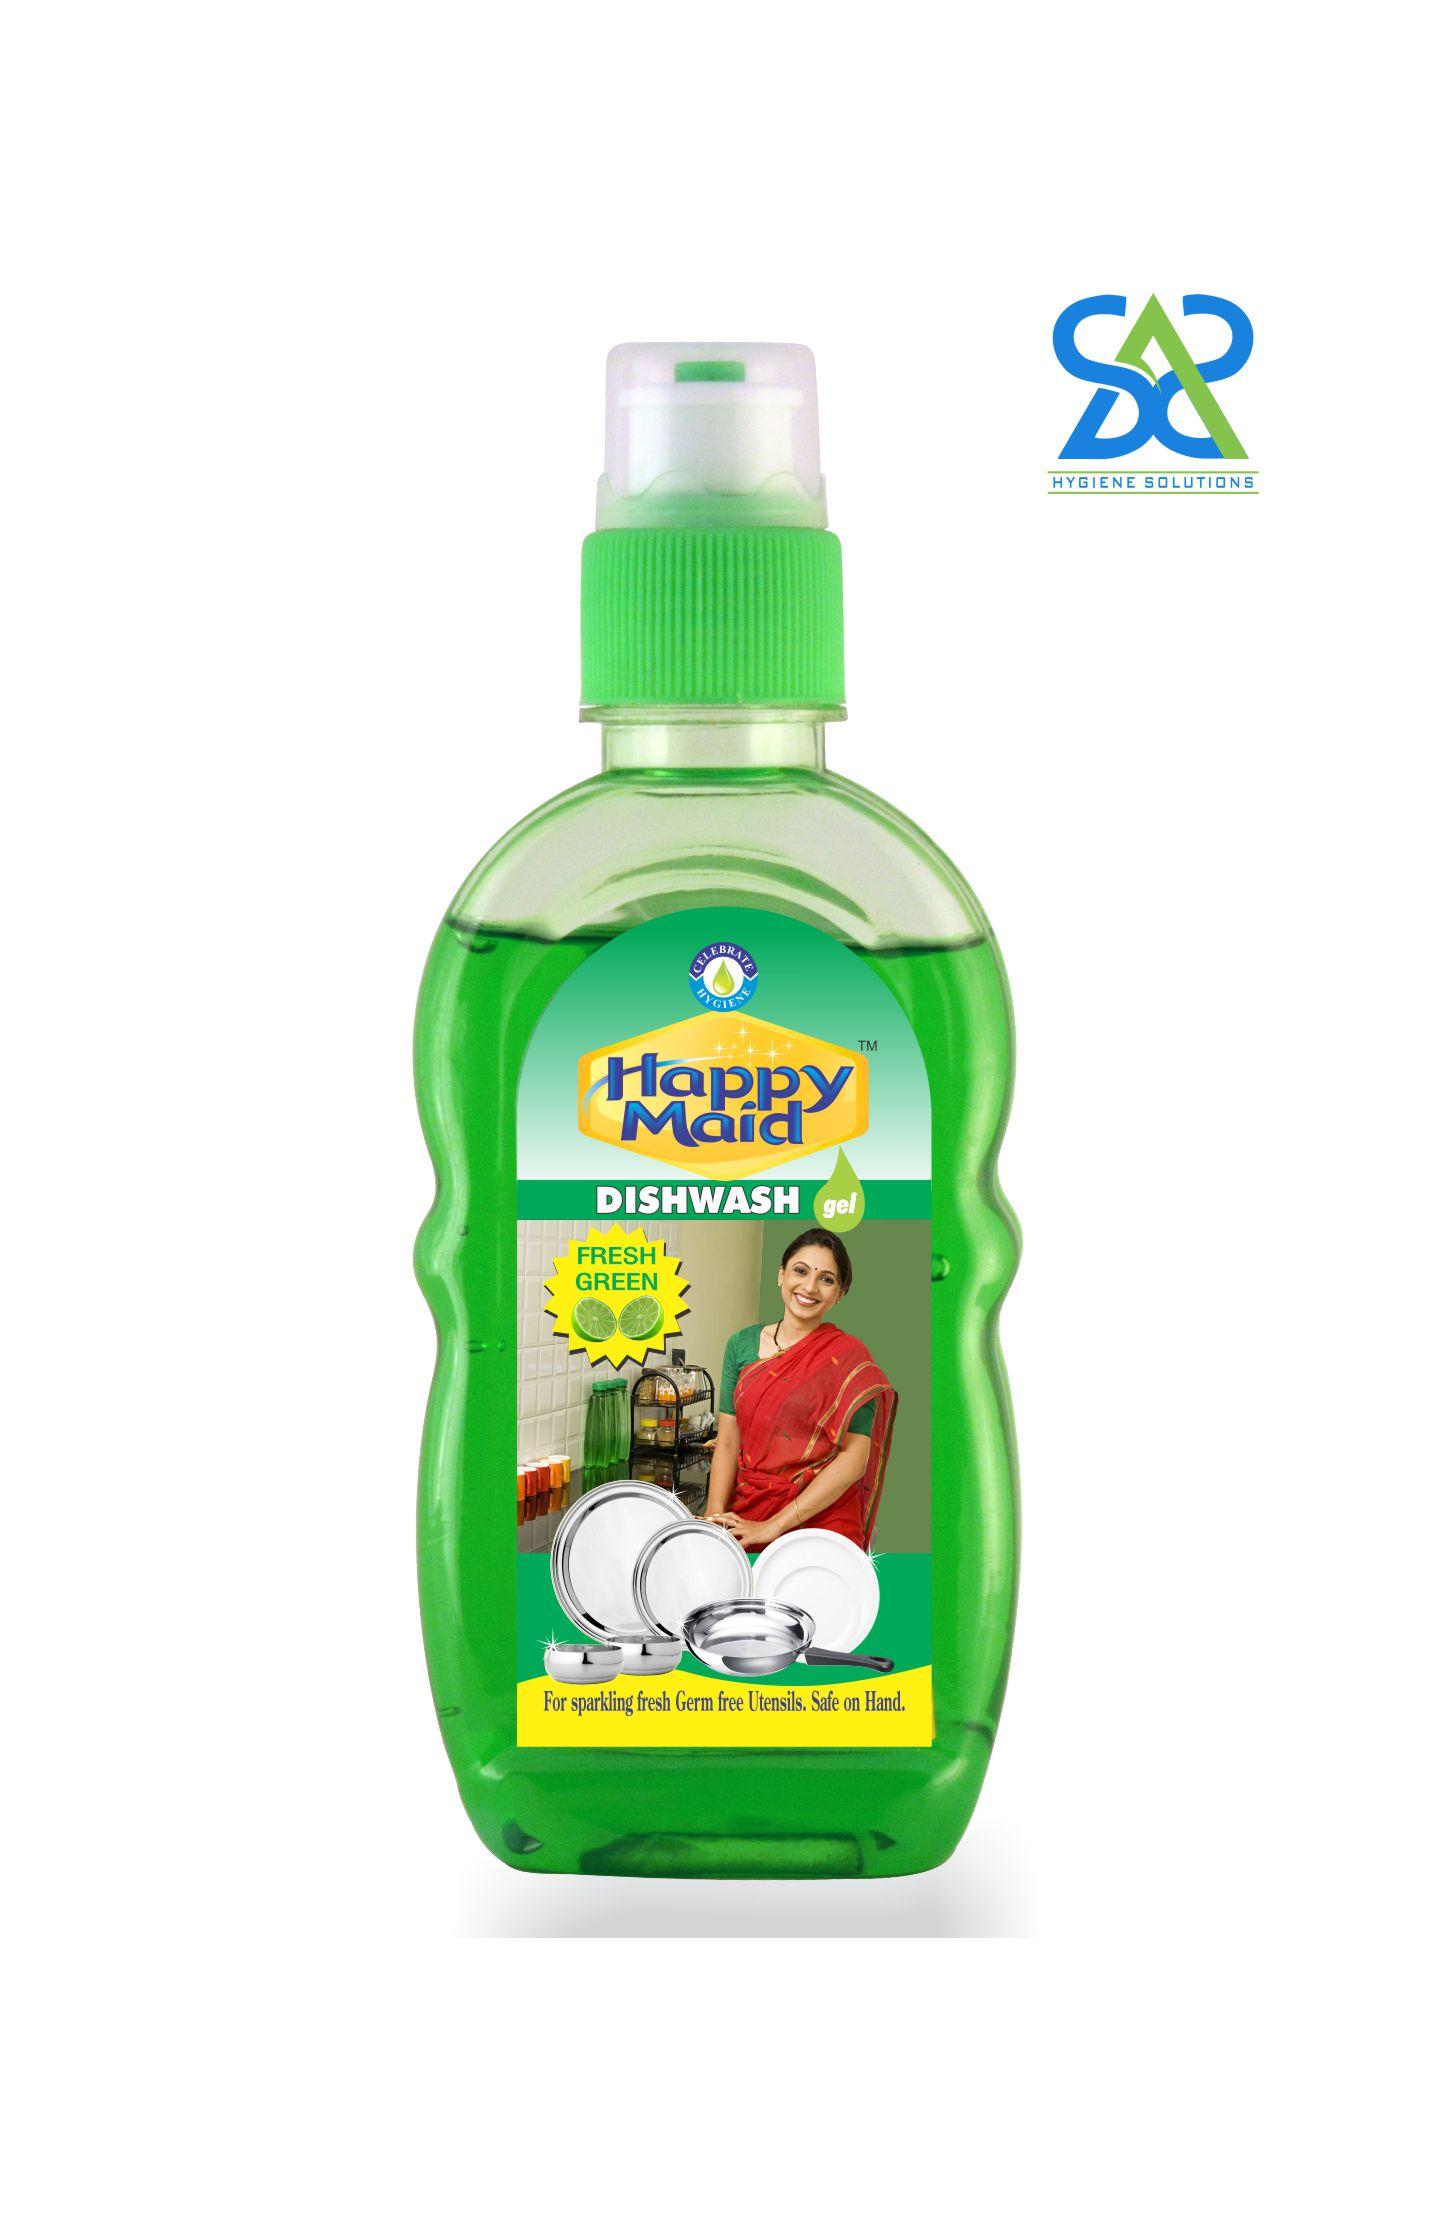 Happy Maid Fresh Green Liquid Dishwash, 500ml